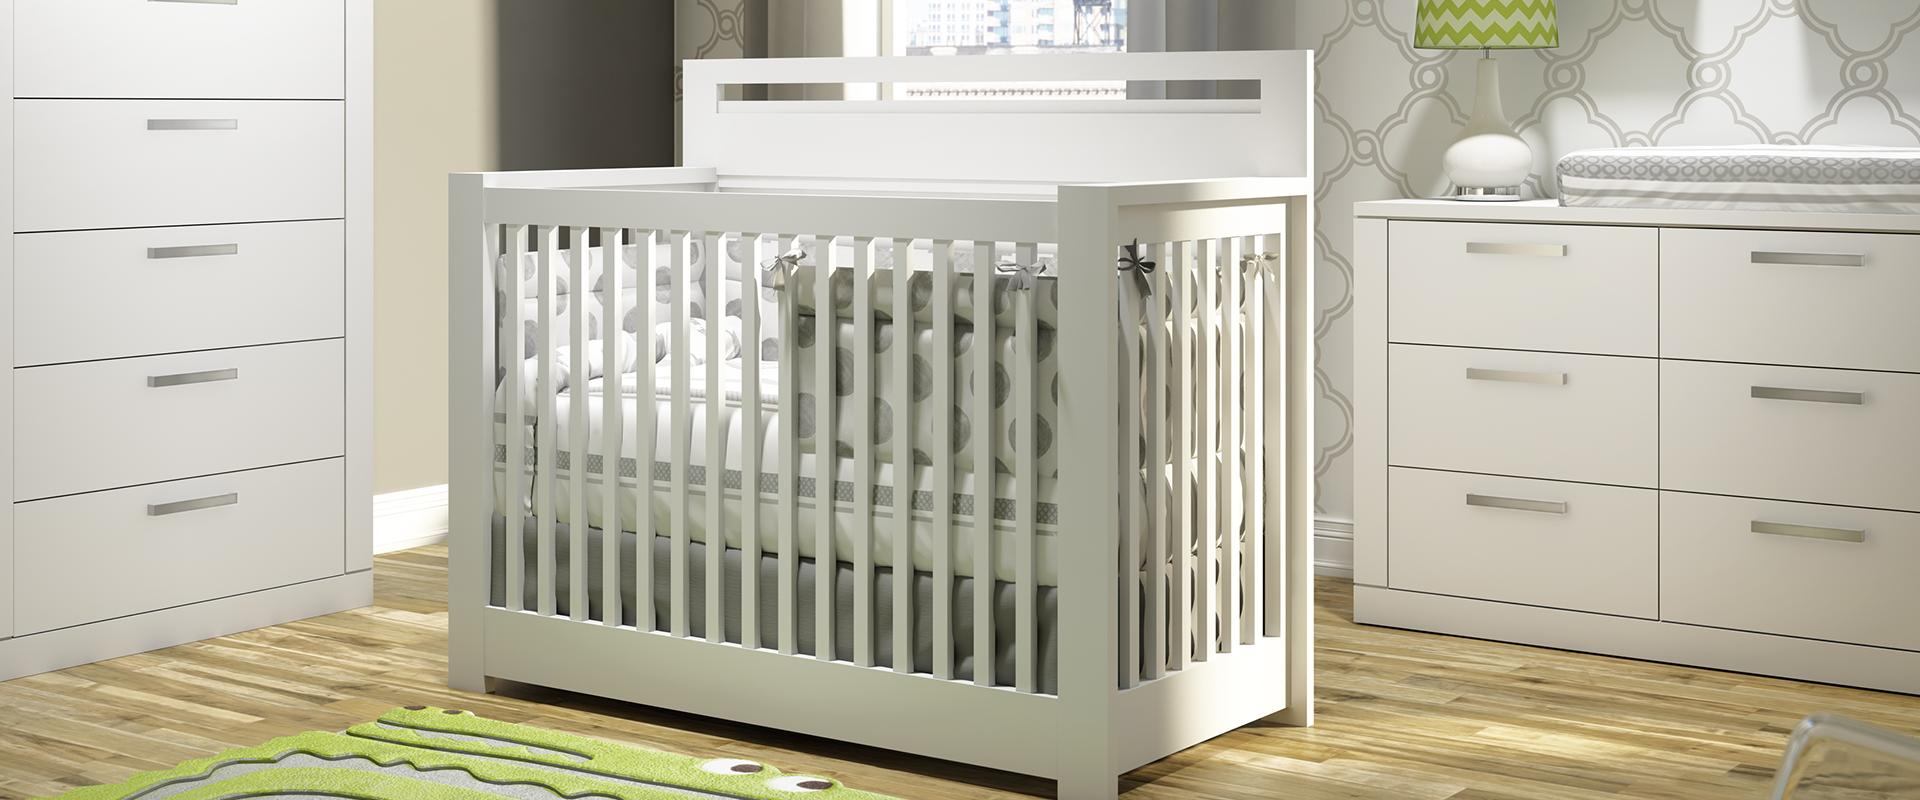 Essentia Organic Mattresses. Greenguard Certified Hypoallergenic Baby MattressesNest Juvenile